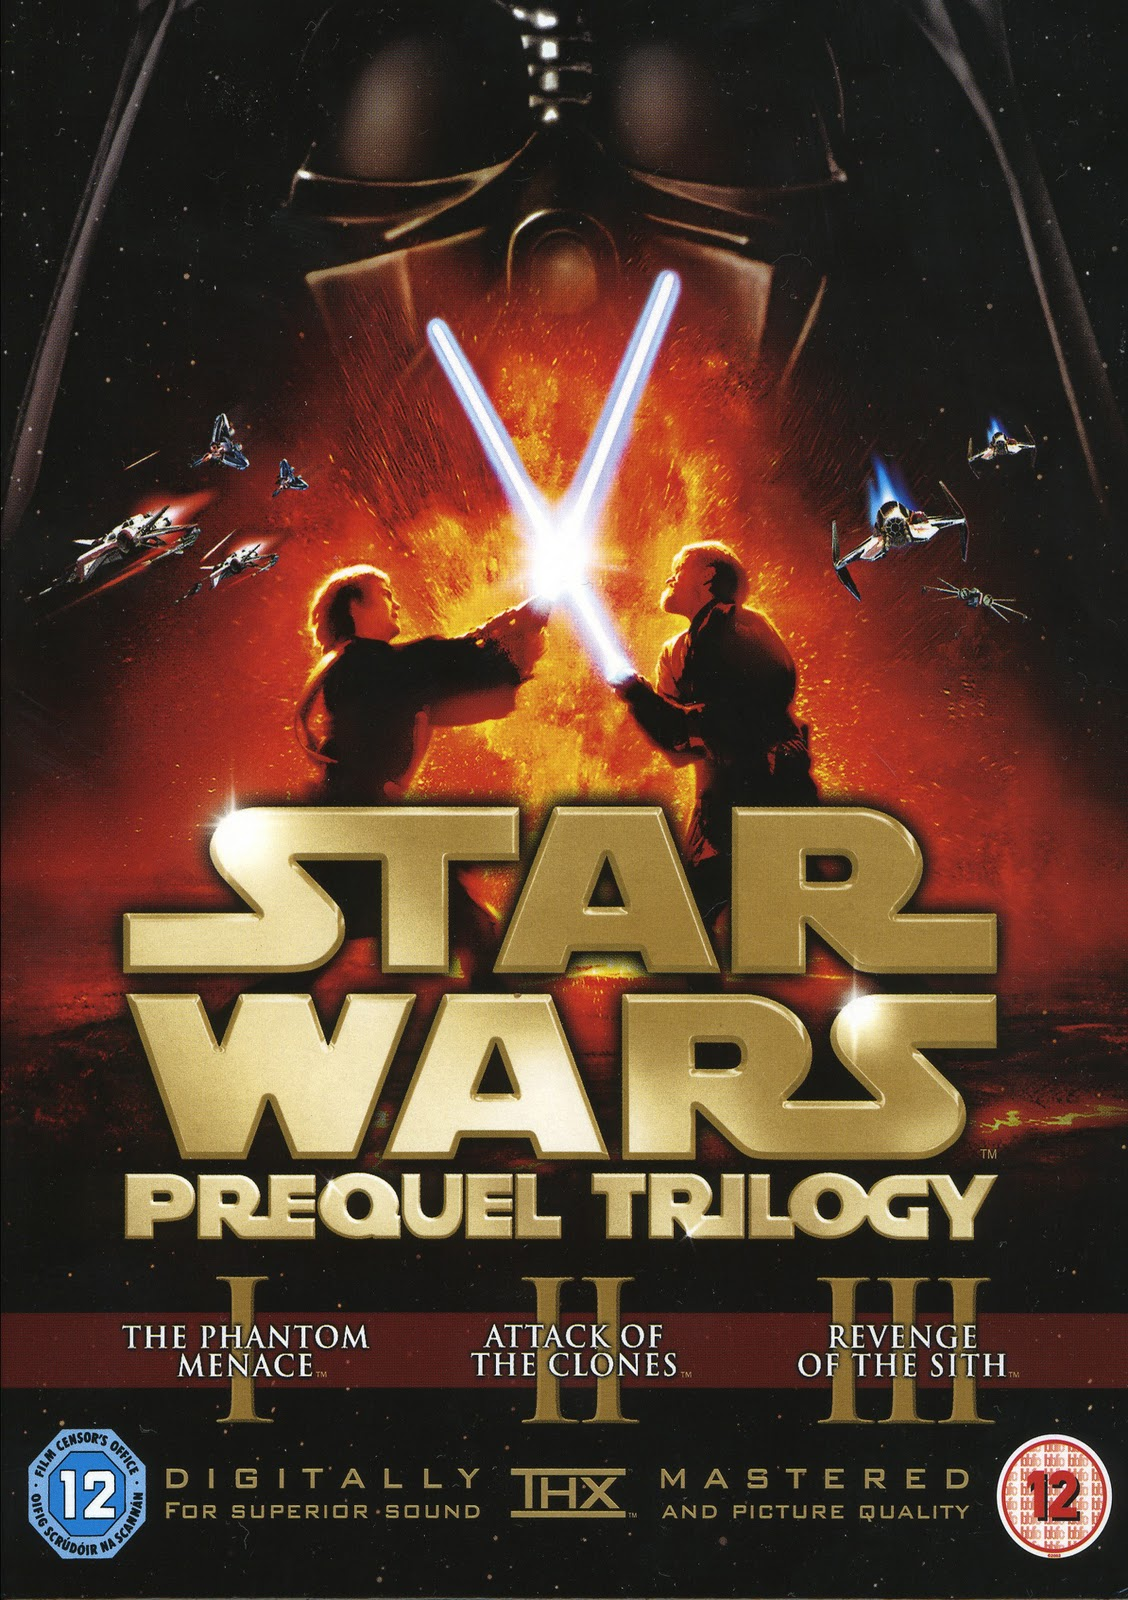 Top 10 teen movies 2008